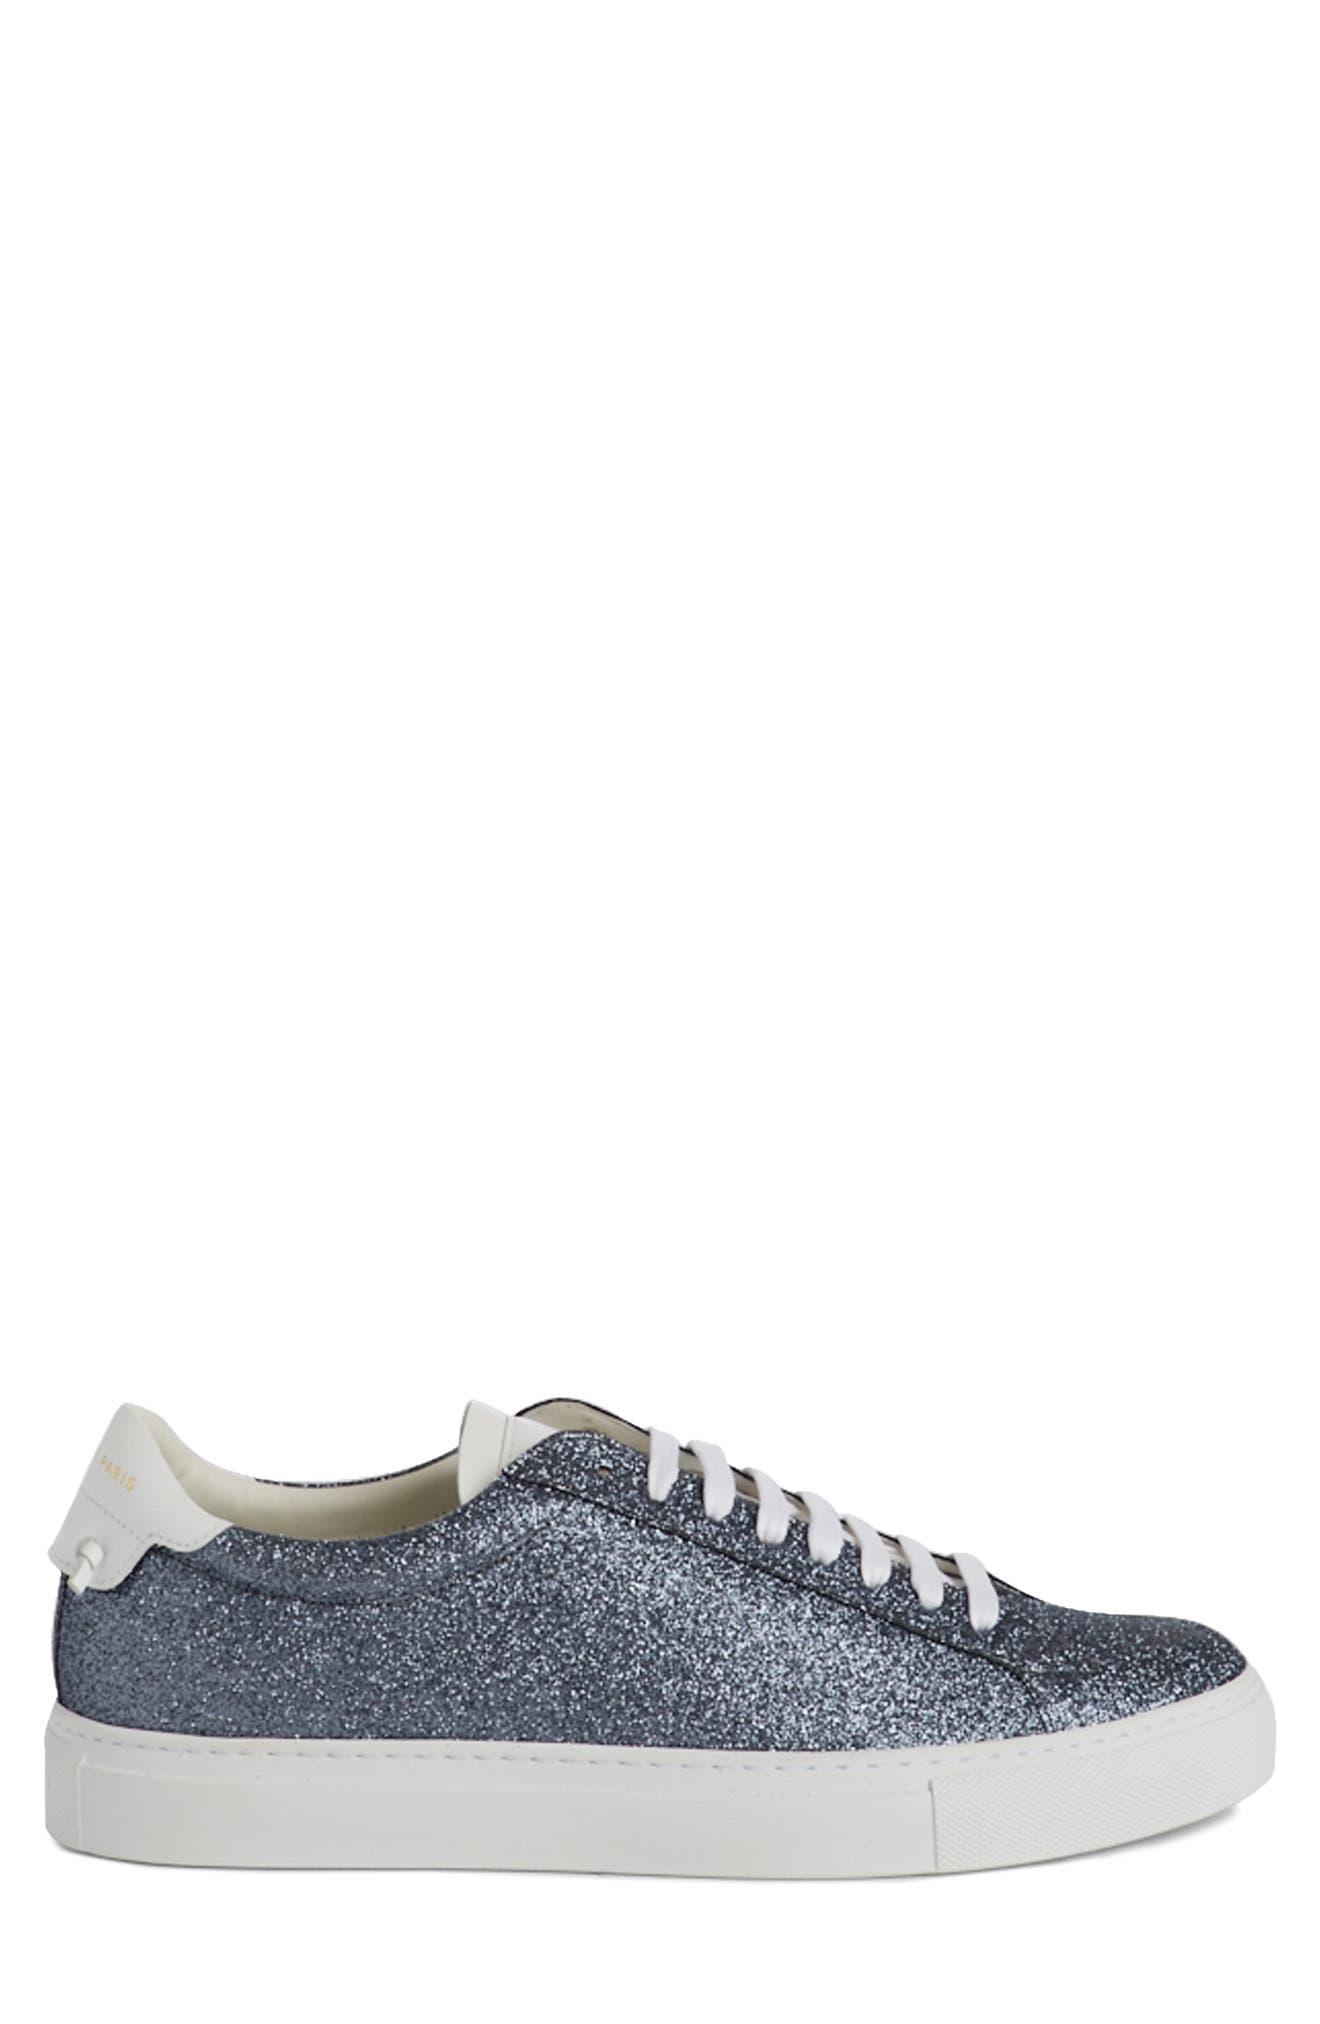 Urban Knots Glitter Sneaker,                             Alternate thumbnail 3, color,                             020